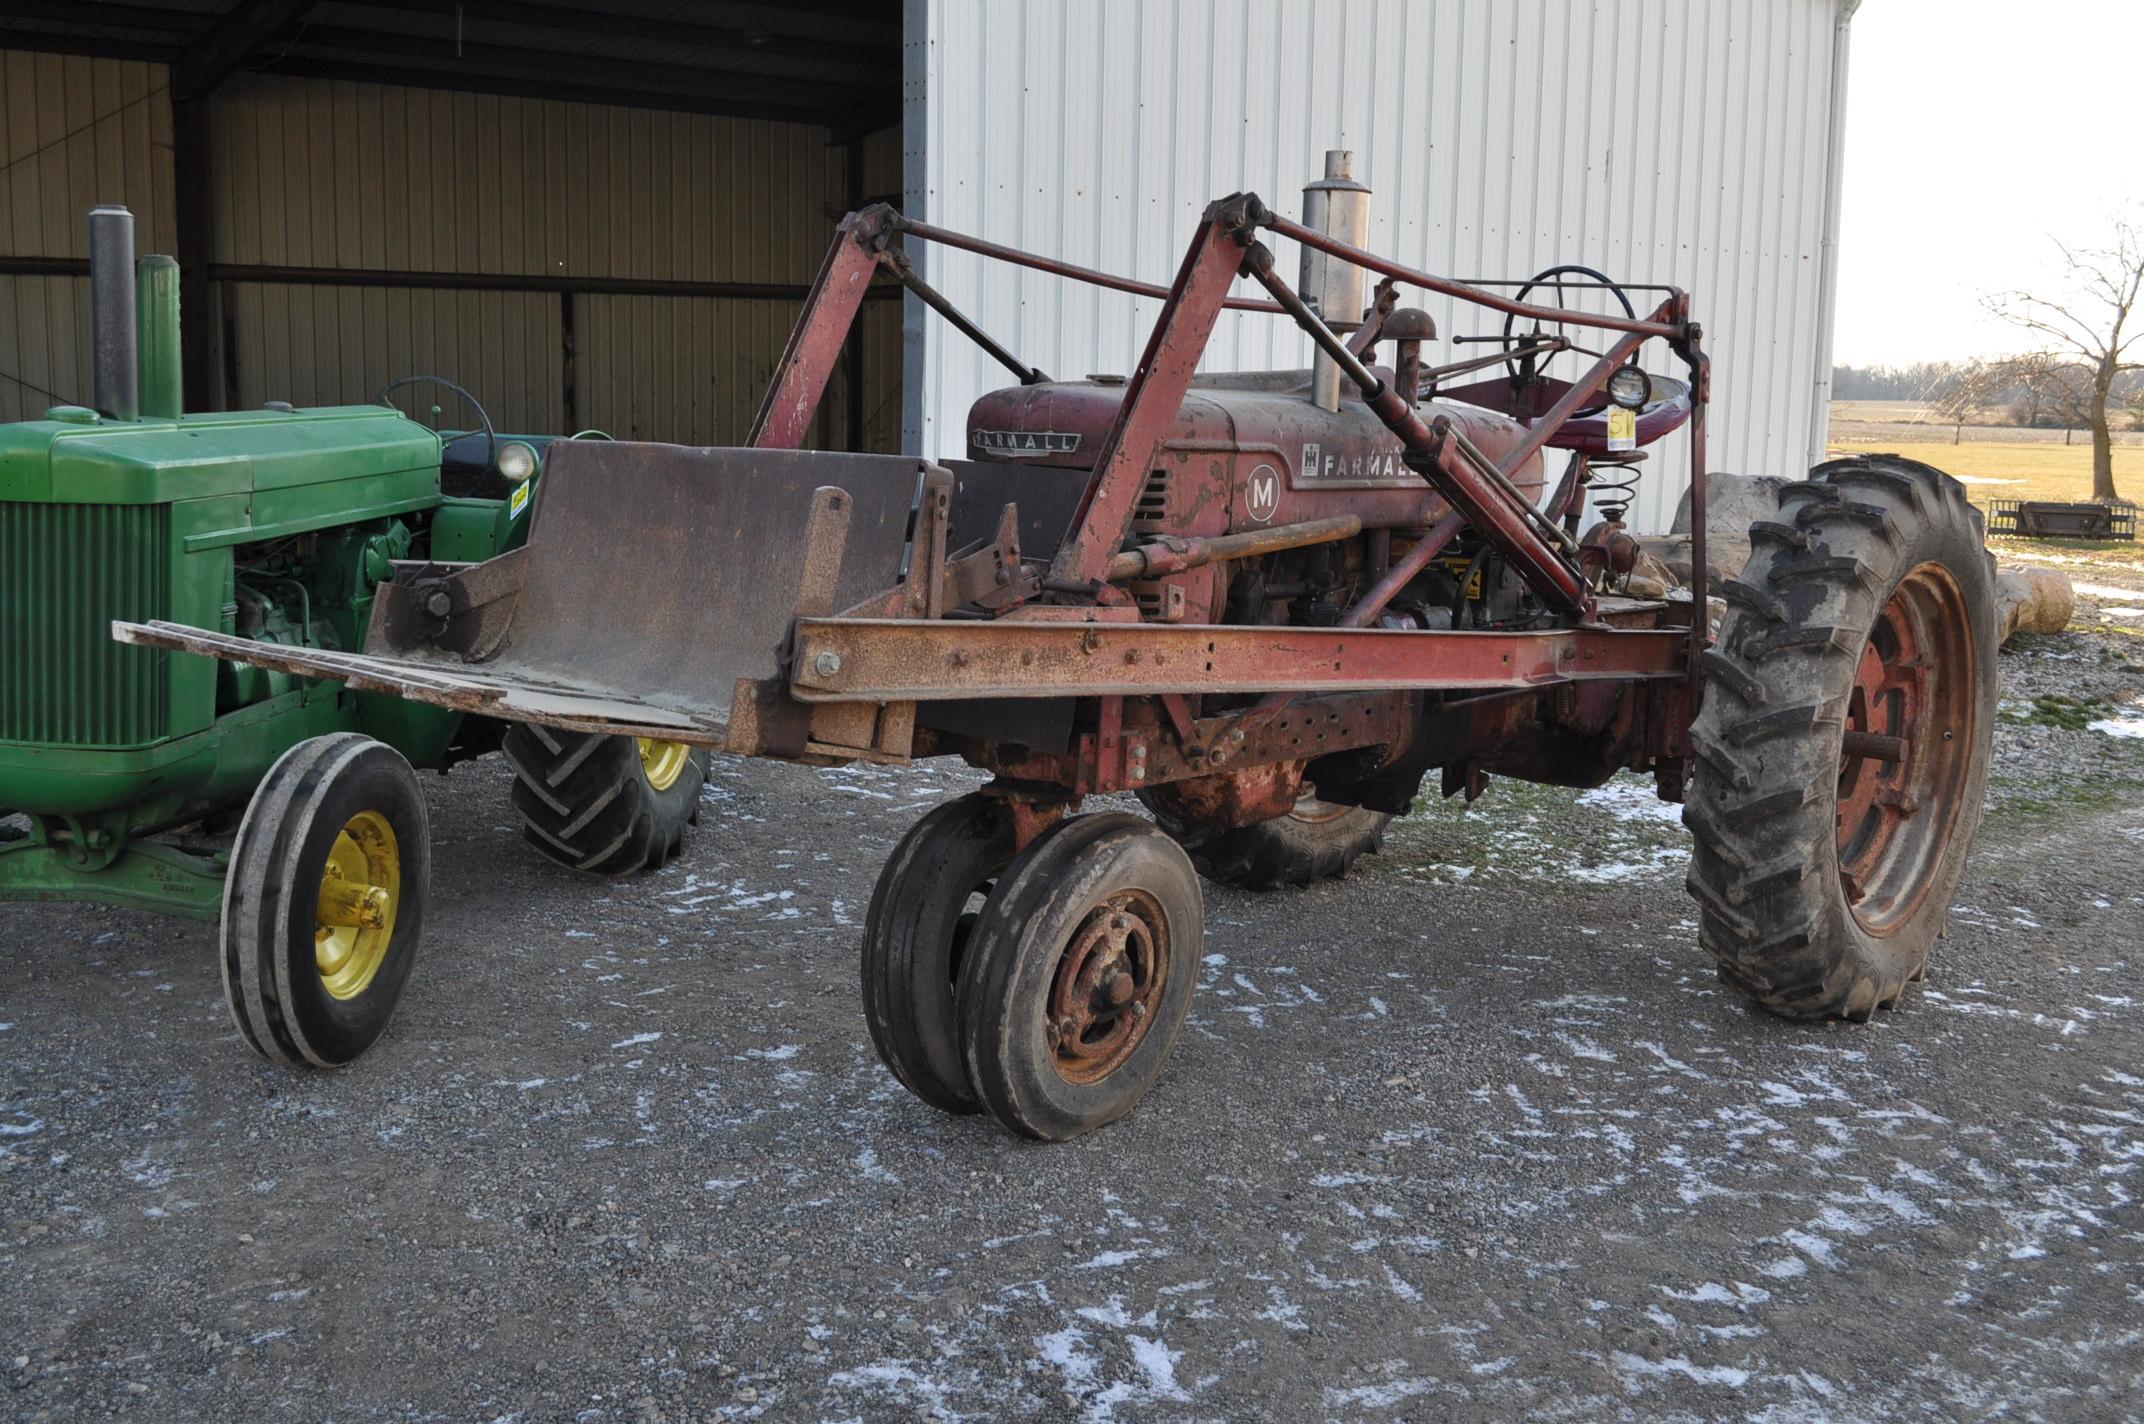 Farmall M tractor, 13.6-38 rear, narrow front, gasoline, loader, 540 PTO, SN FBK276